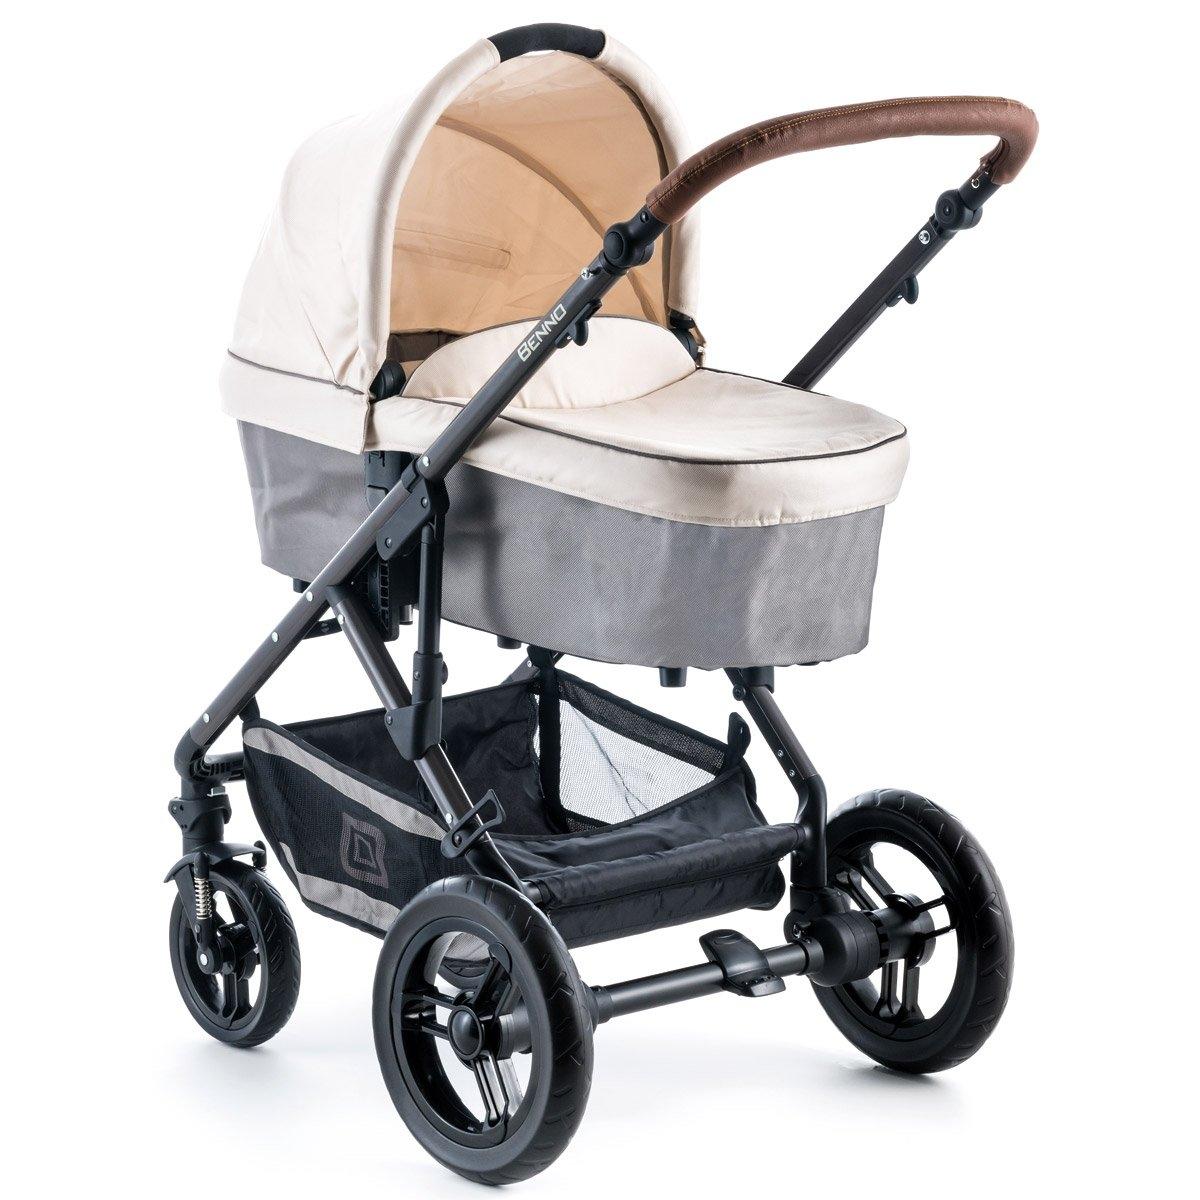 moon kombikinderwagen benno design 2015 farbe w hlbar neu ebay. Black Bedroom Furniture Sets. Home Design Ideas